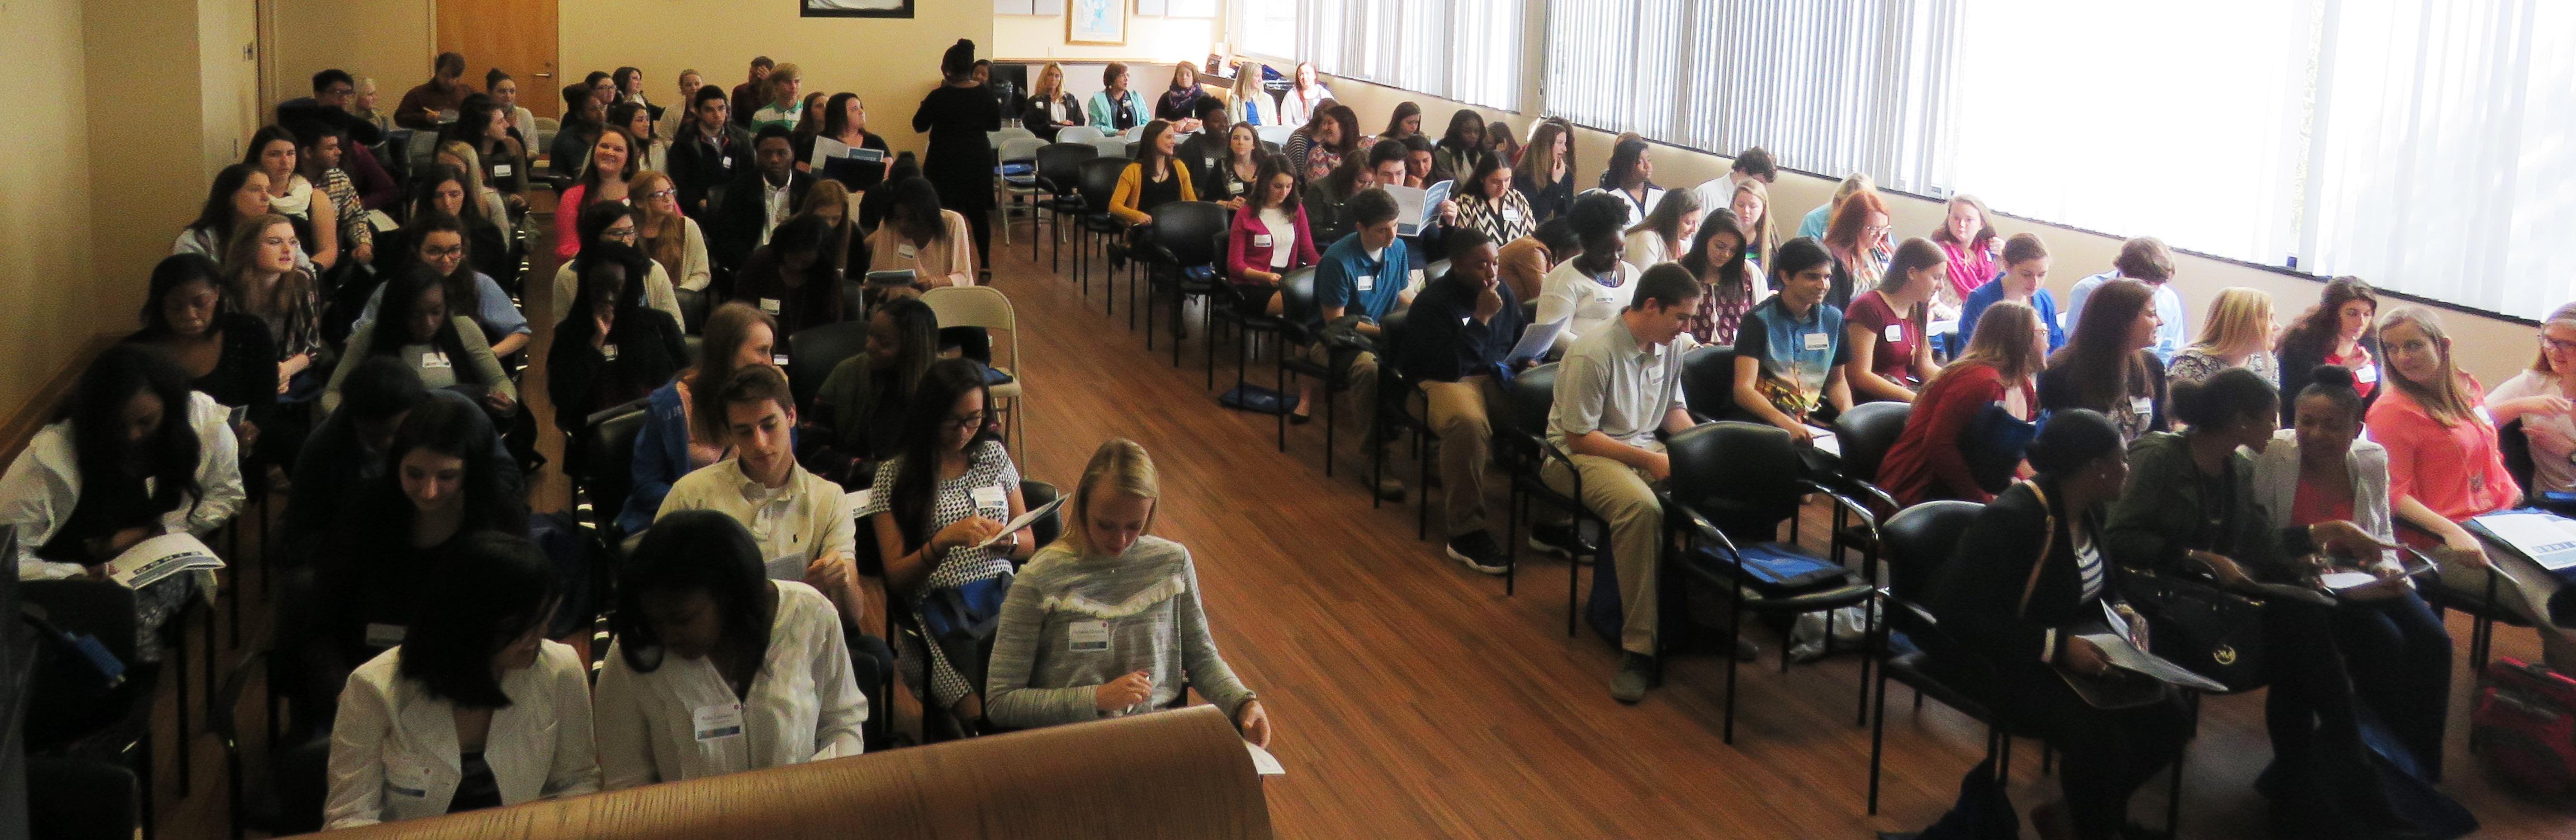 CCSD CTE | MUSC Hosts Campus Visit and Career Fair for